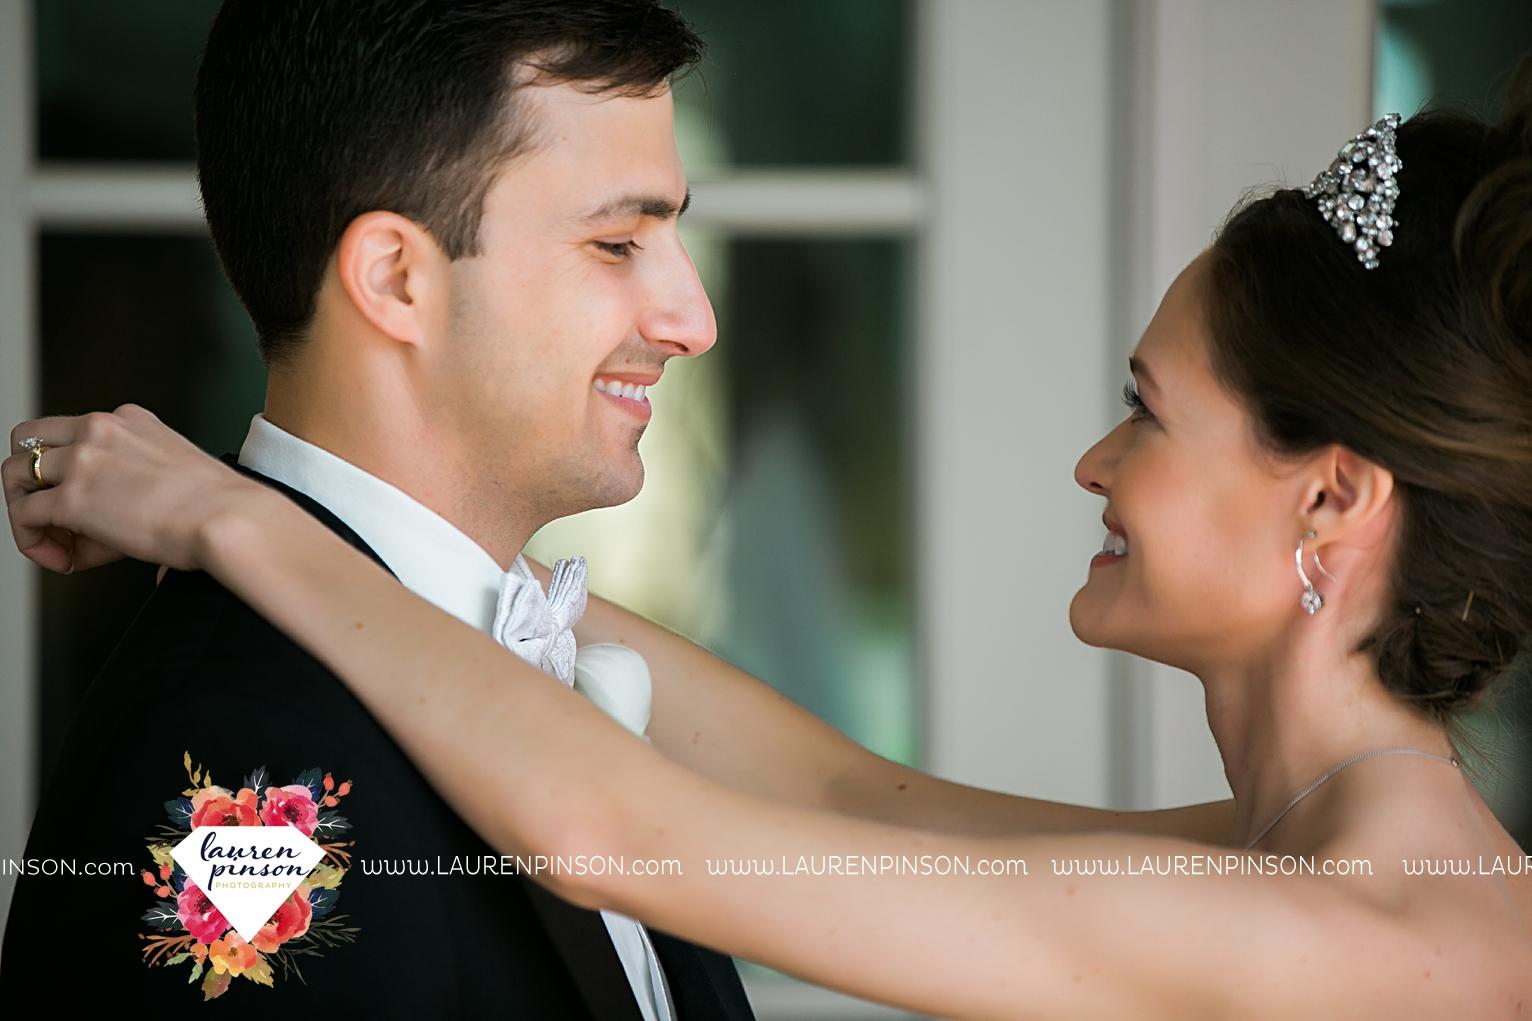 wichita-falls-texas-wedding-photographer-the-forum-by-the-kemp-mayfield-events-ulta-gold-glitter_2828.jpg